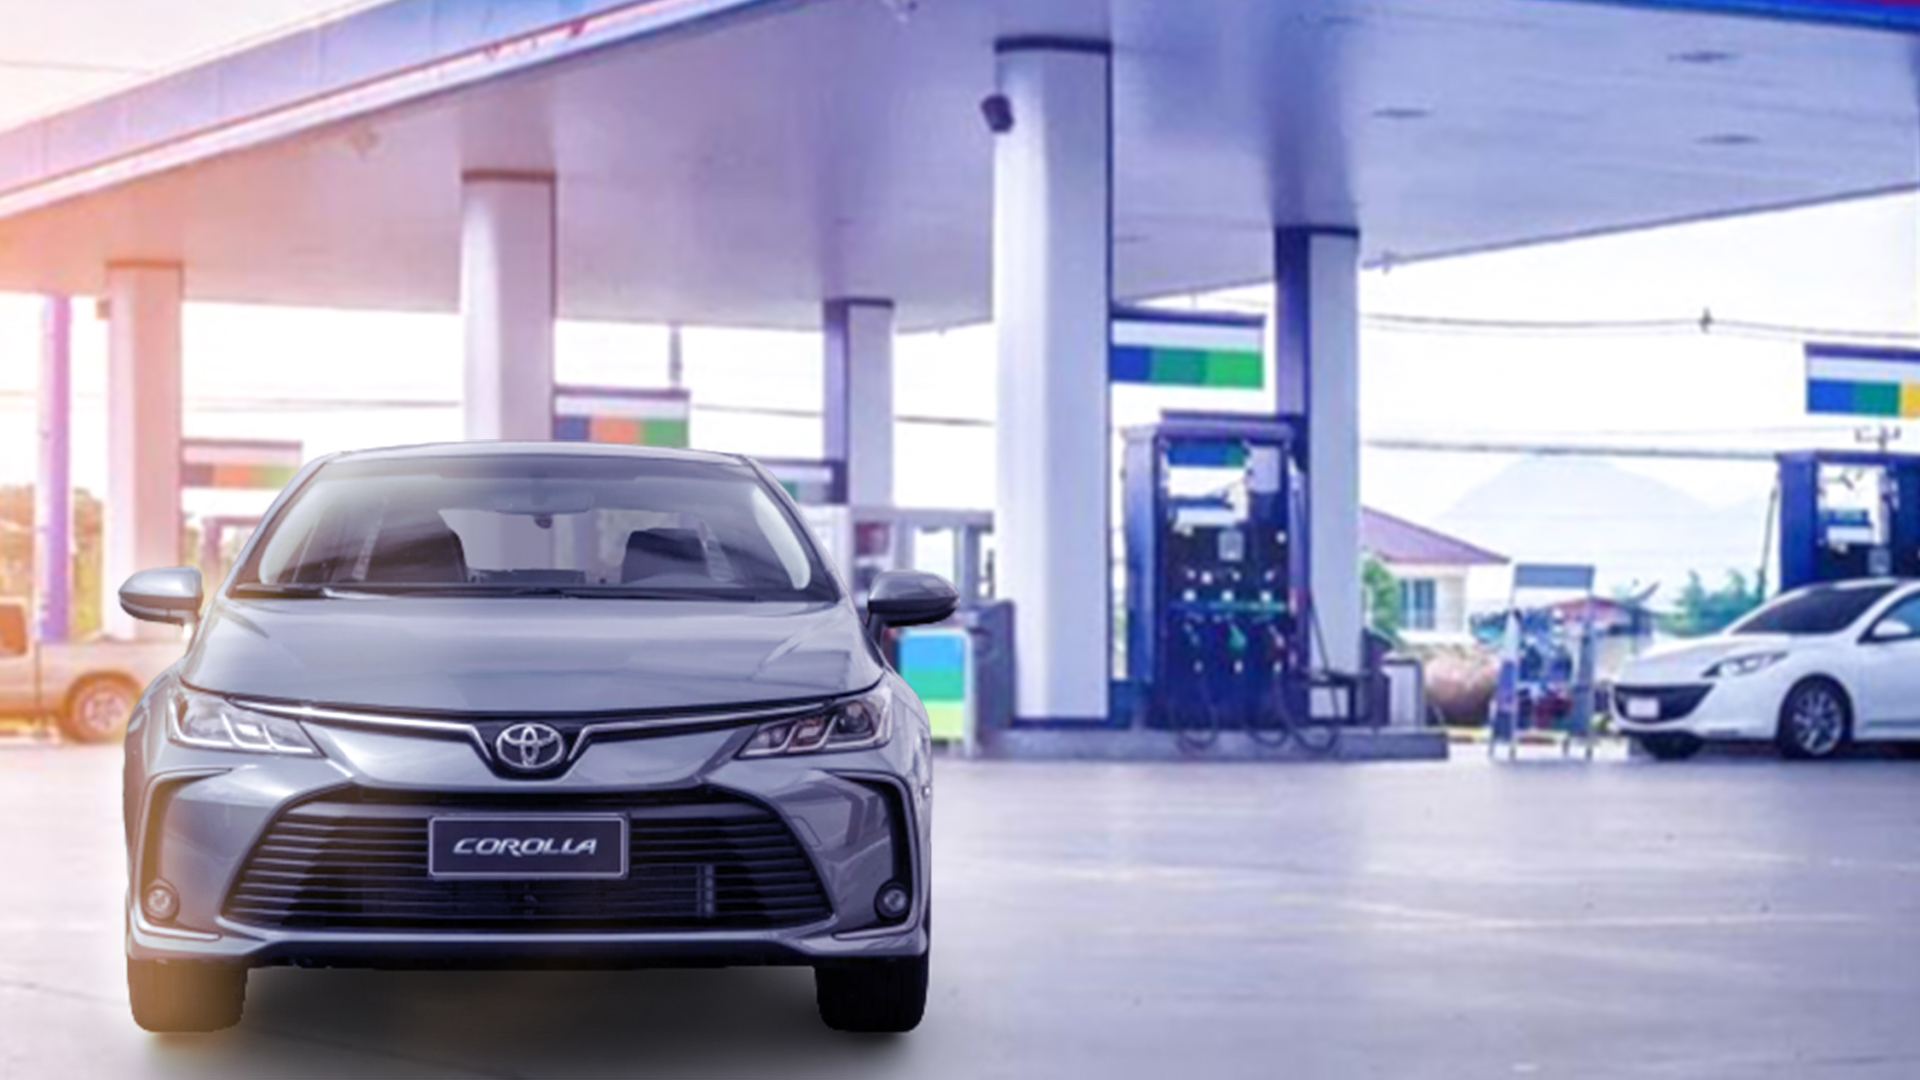 Toyota Corolla está entre os carros mais econômicos do país